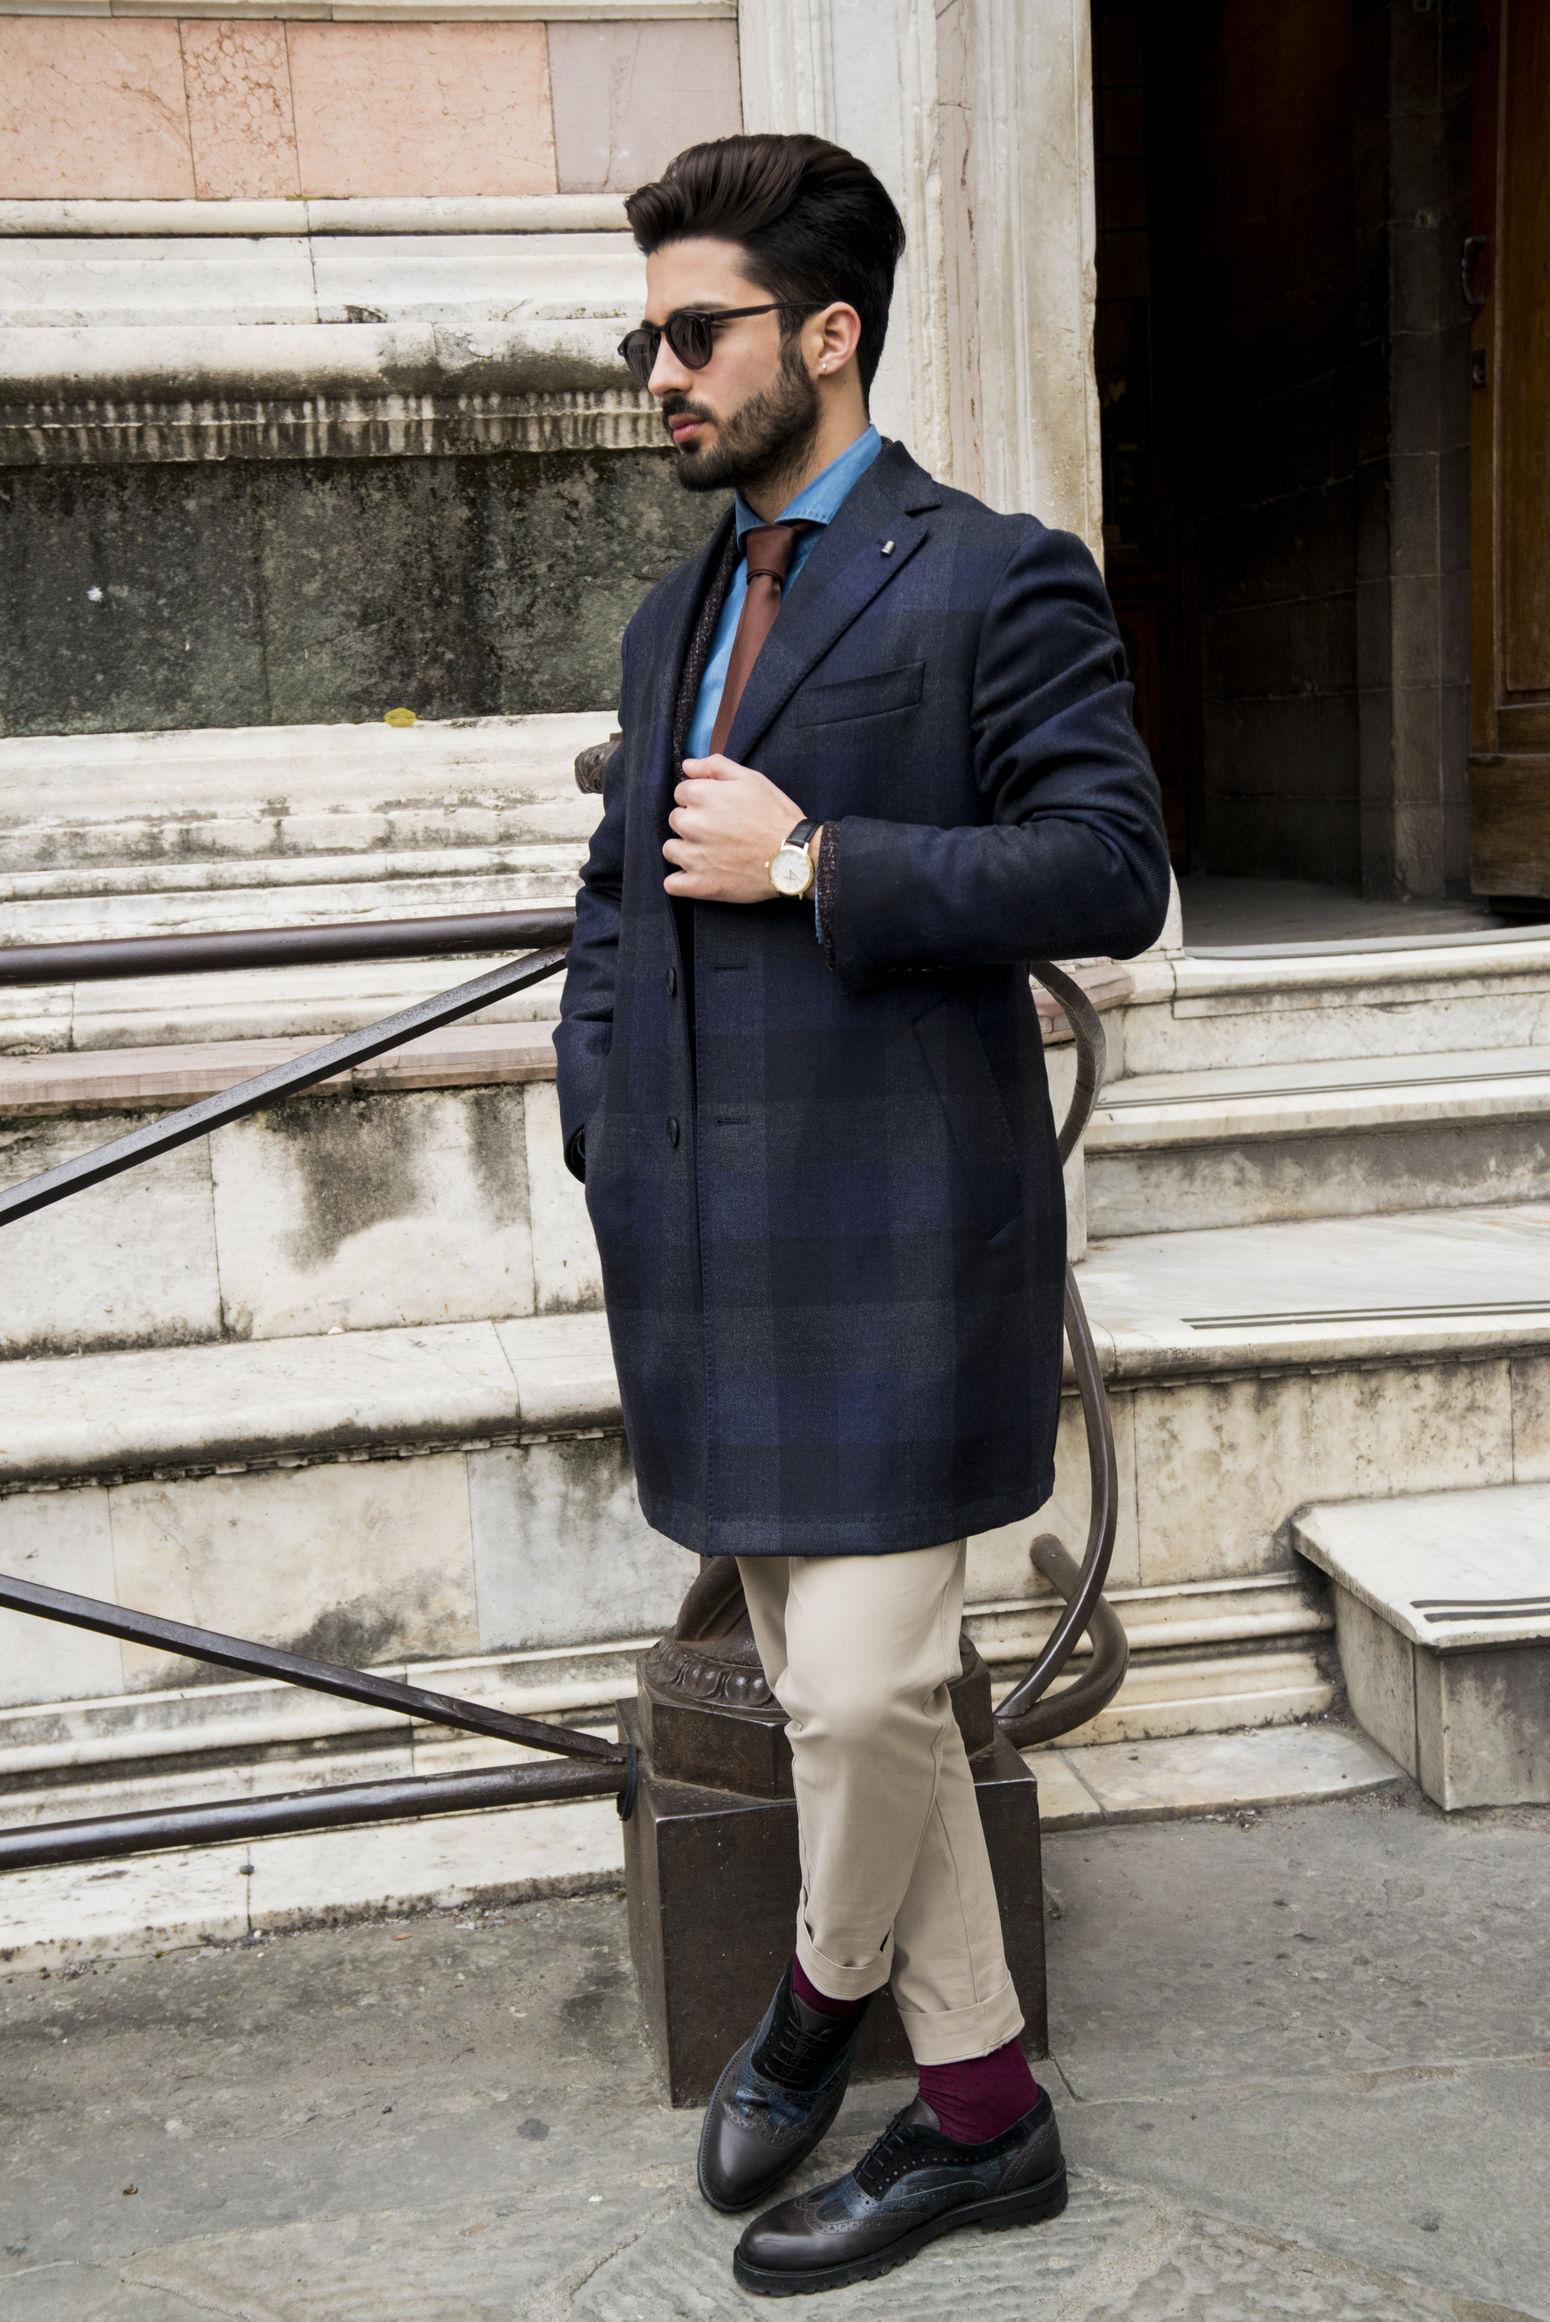 "En-🇬🇧 Do you remember the last Pitti? This edition I wore this fantastic coat by Sartoria La Torre. Very high quality and innovation as well as uniqueness given by the thimble. This Brand is one of those companies that make me feel more and more convinced that ""Made in Italy"" is Precious 🇬🇧 —————————————————————— It-🇮🇹 Ricordate lo scorso Pitti? Per questa edizione ho indossato questo fantastico cappotto by Sartoria La Torre. Altissima qualità ed innovazione oltre che unicità data dal ditale. Questo Brand fa parte di quelle aziende che mi rendono sempre più convinto di quanto il Made in Italy sia prezioso.🇮🇹 Beard Classy Coat Duomo Elégance Fashion Florence Hair Hairstyle Lifestyles Man Marcoparrino Men Mensfashion Ootd Outdoors Philipwatch Pitti91 Sartorialatorre Shirt Socks Sunglasses Tie Watch Watches"